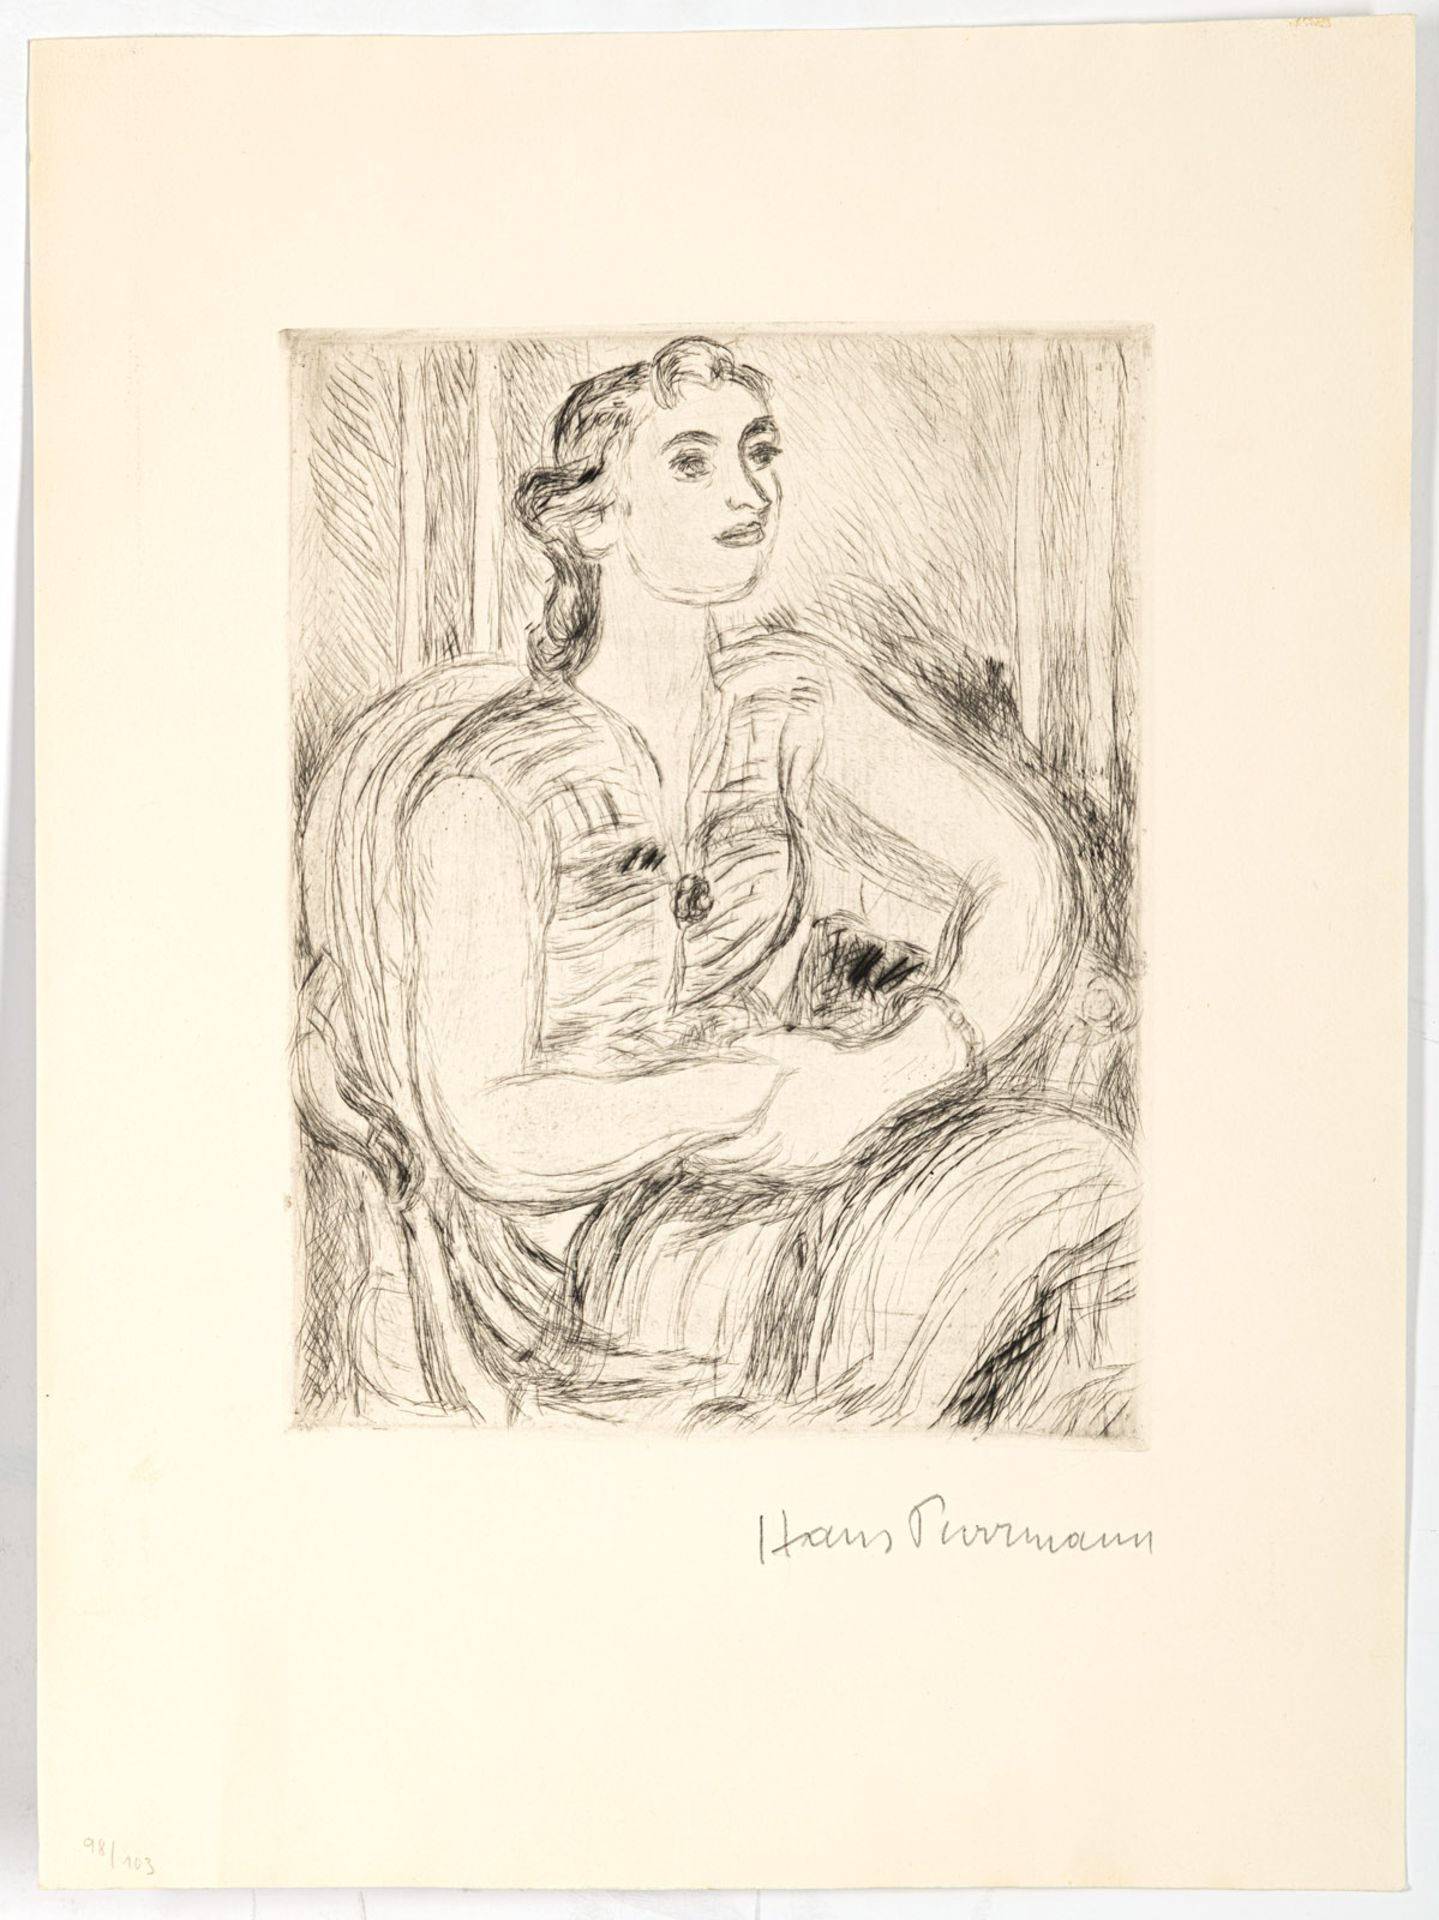 Purrmann, Hans - Image 4 of 6